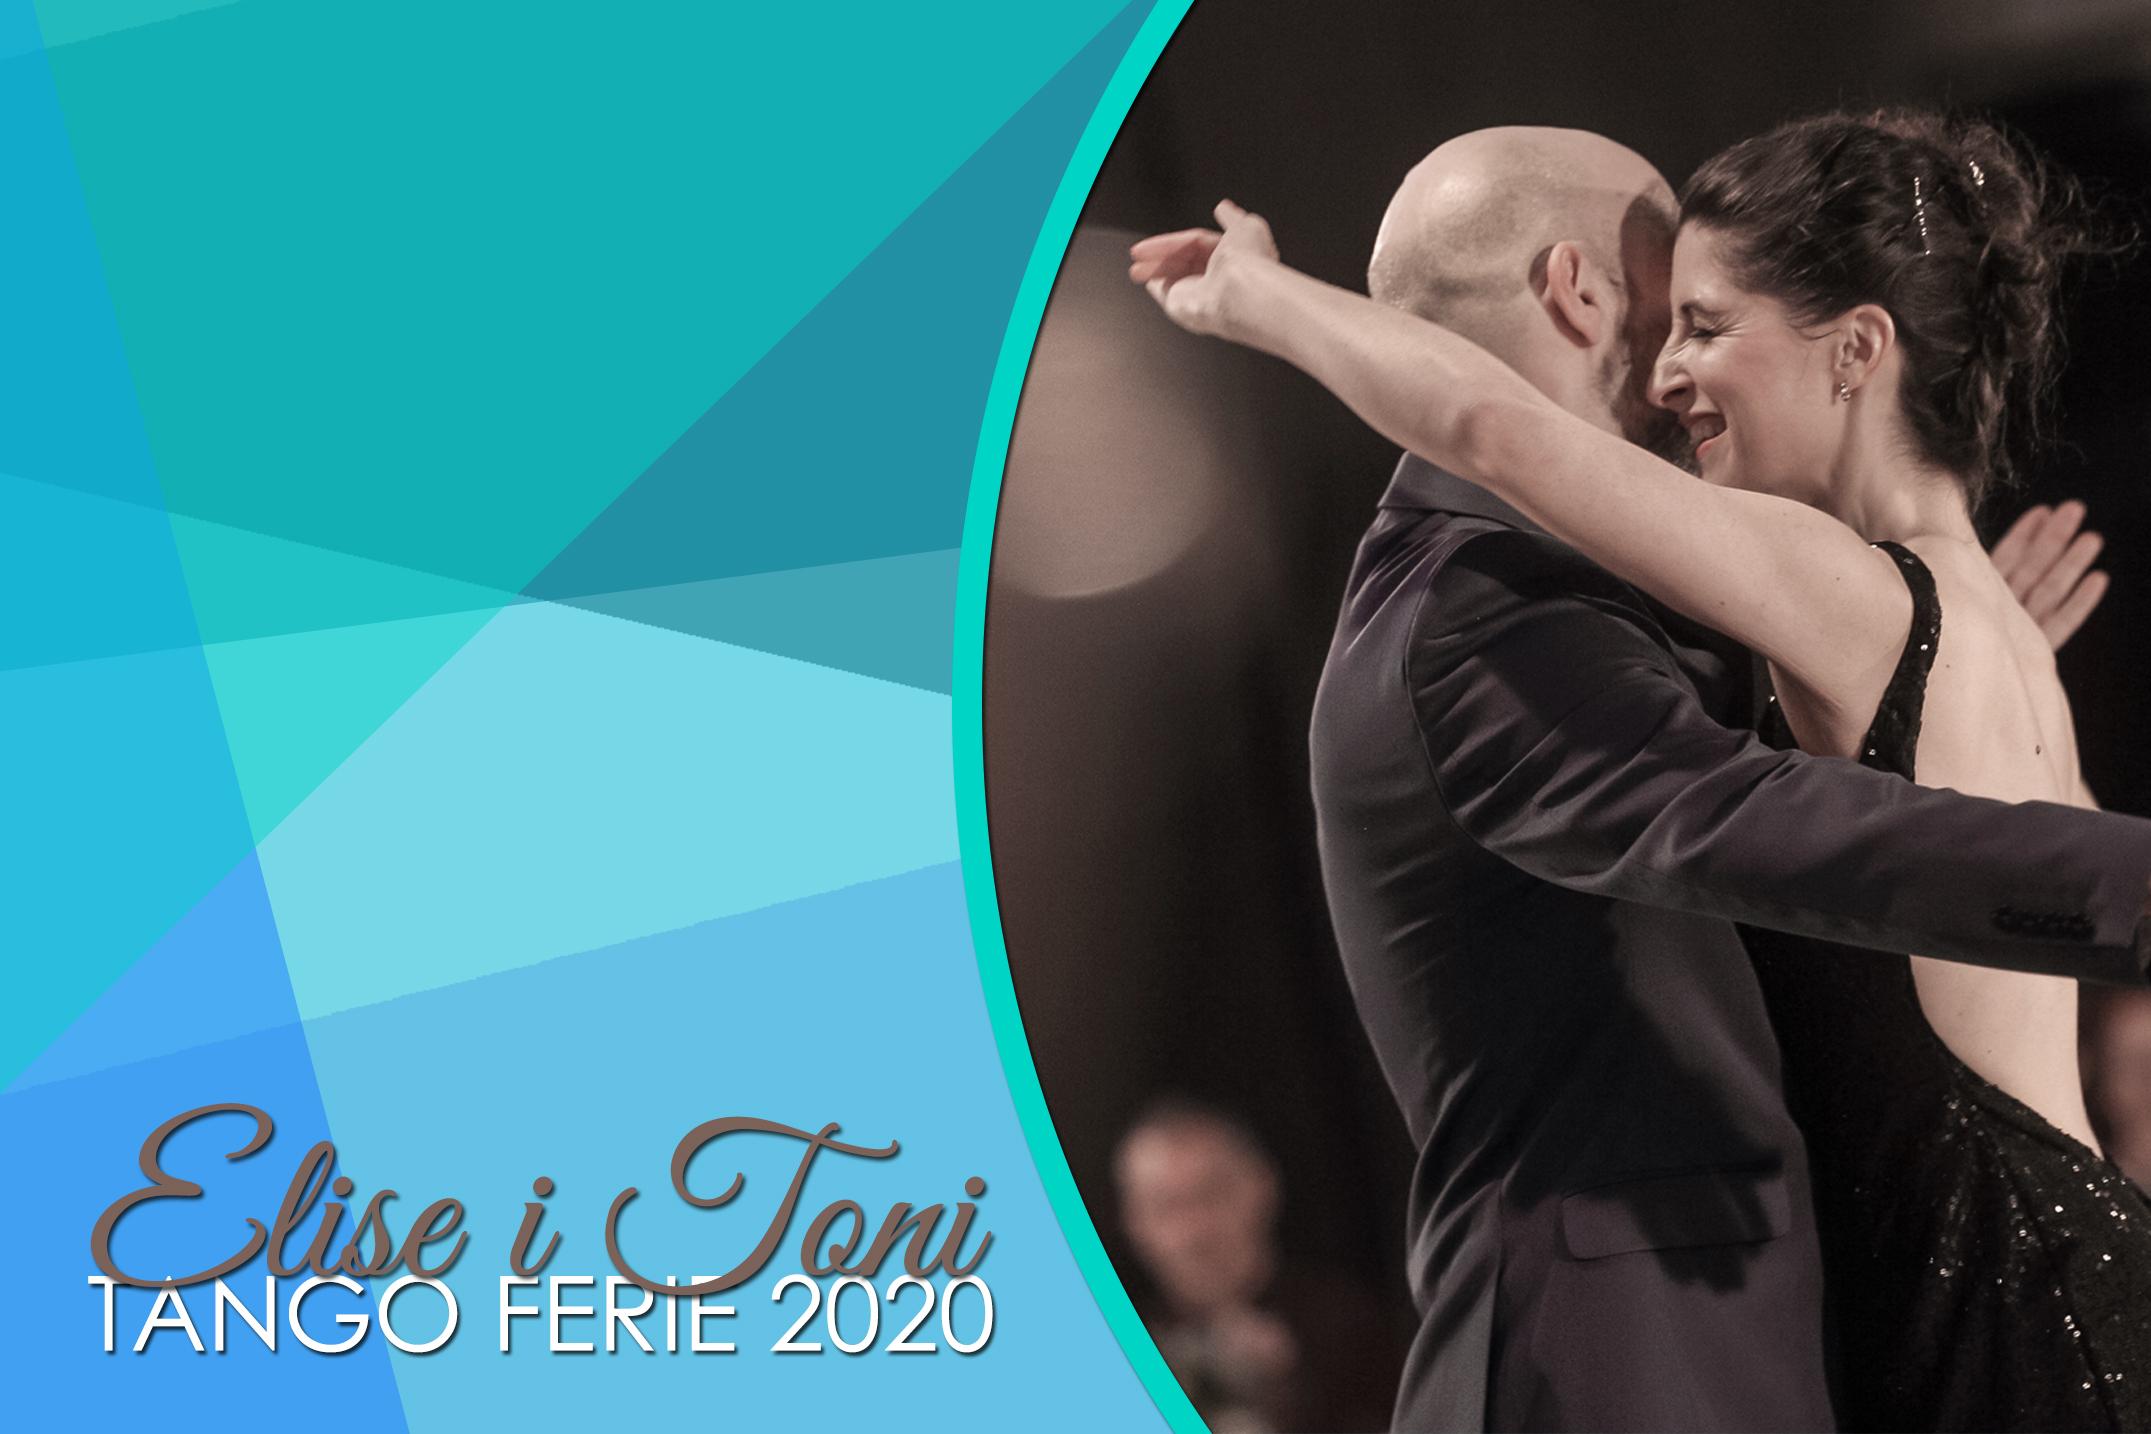 Tango Ferie 2020 z Elise Roulin i Tonim Kastelan